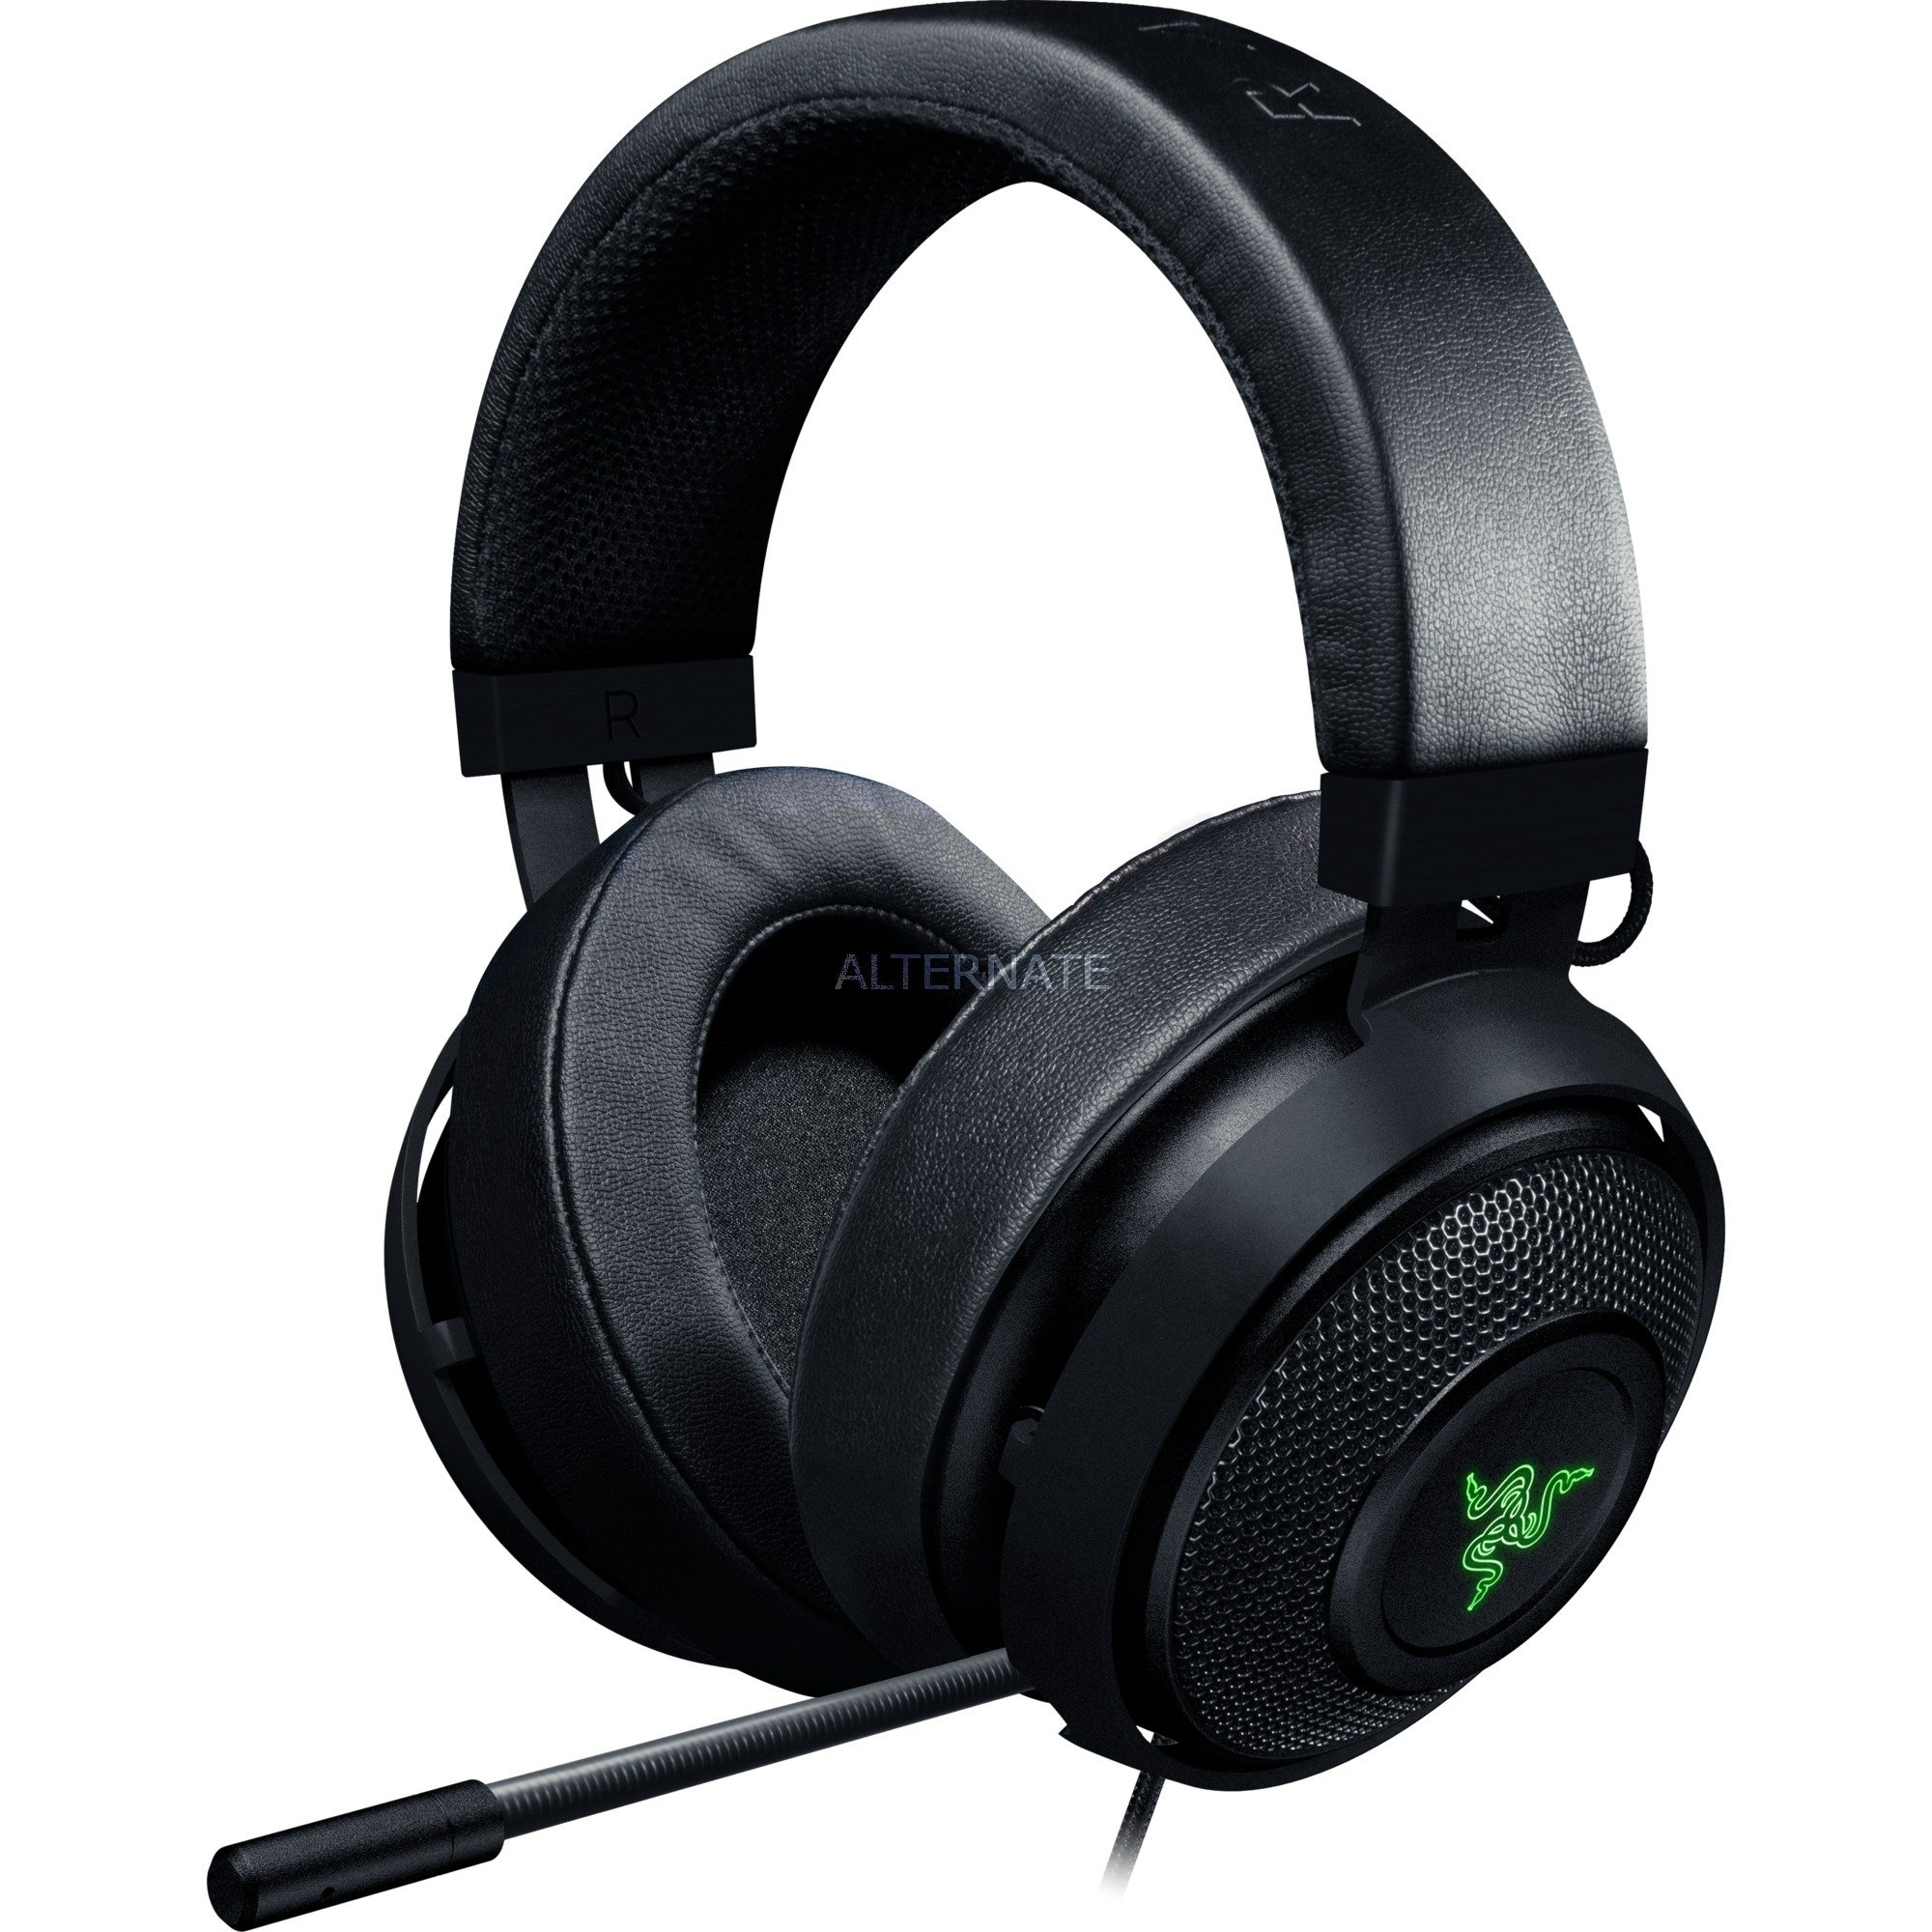 Kraken V2 7.1 V2 Binaurale Diadema Negro auricular con micrófono, Auriculares con micrófono